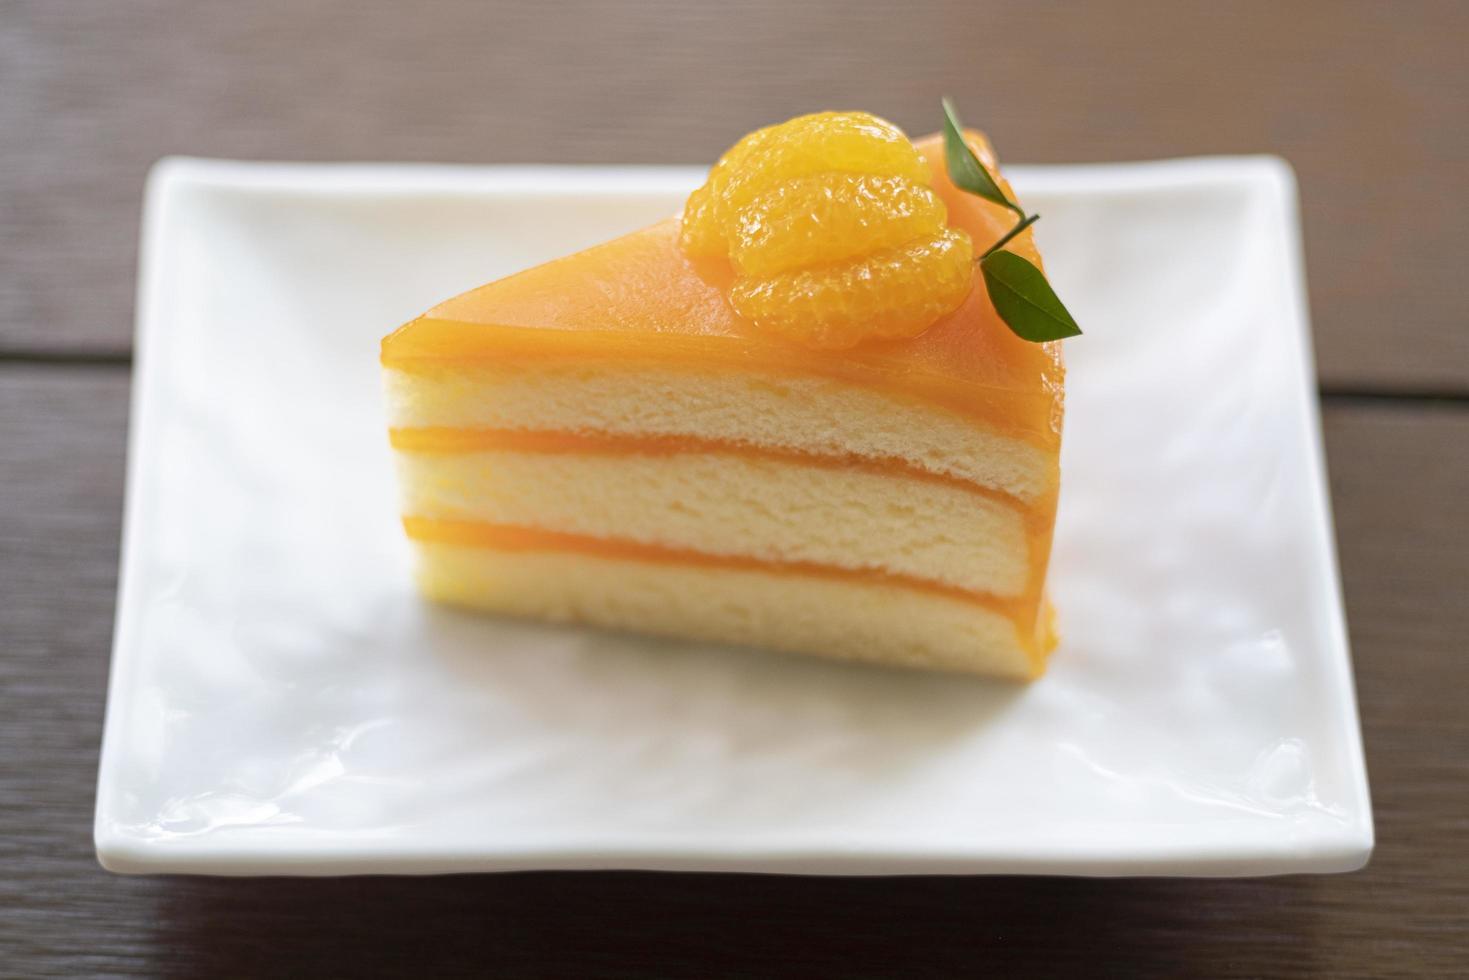 fruit sinaasappeljam slagroomtaart foto